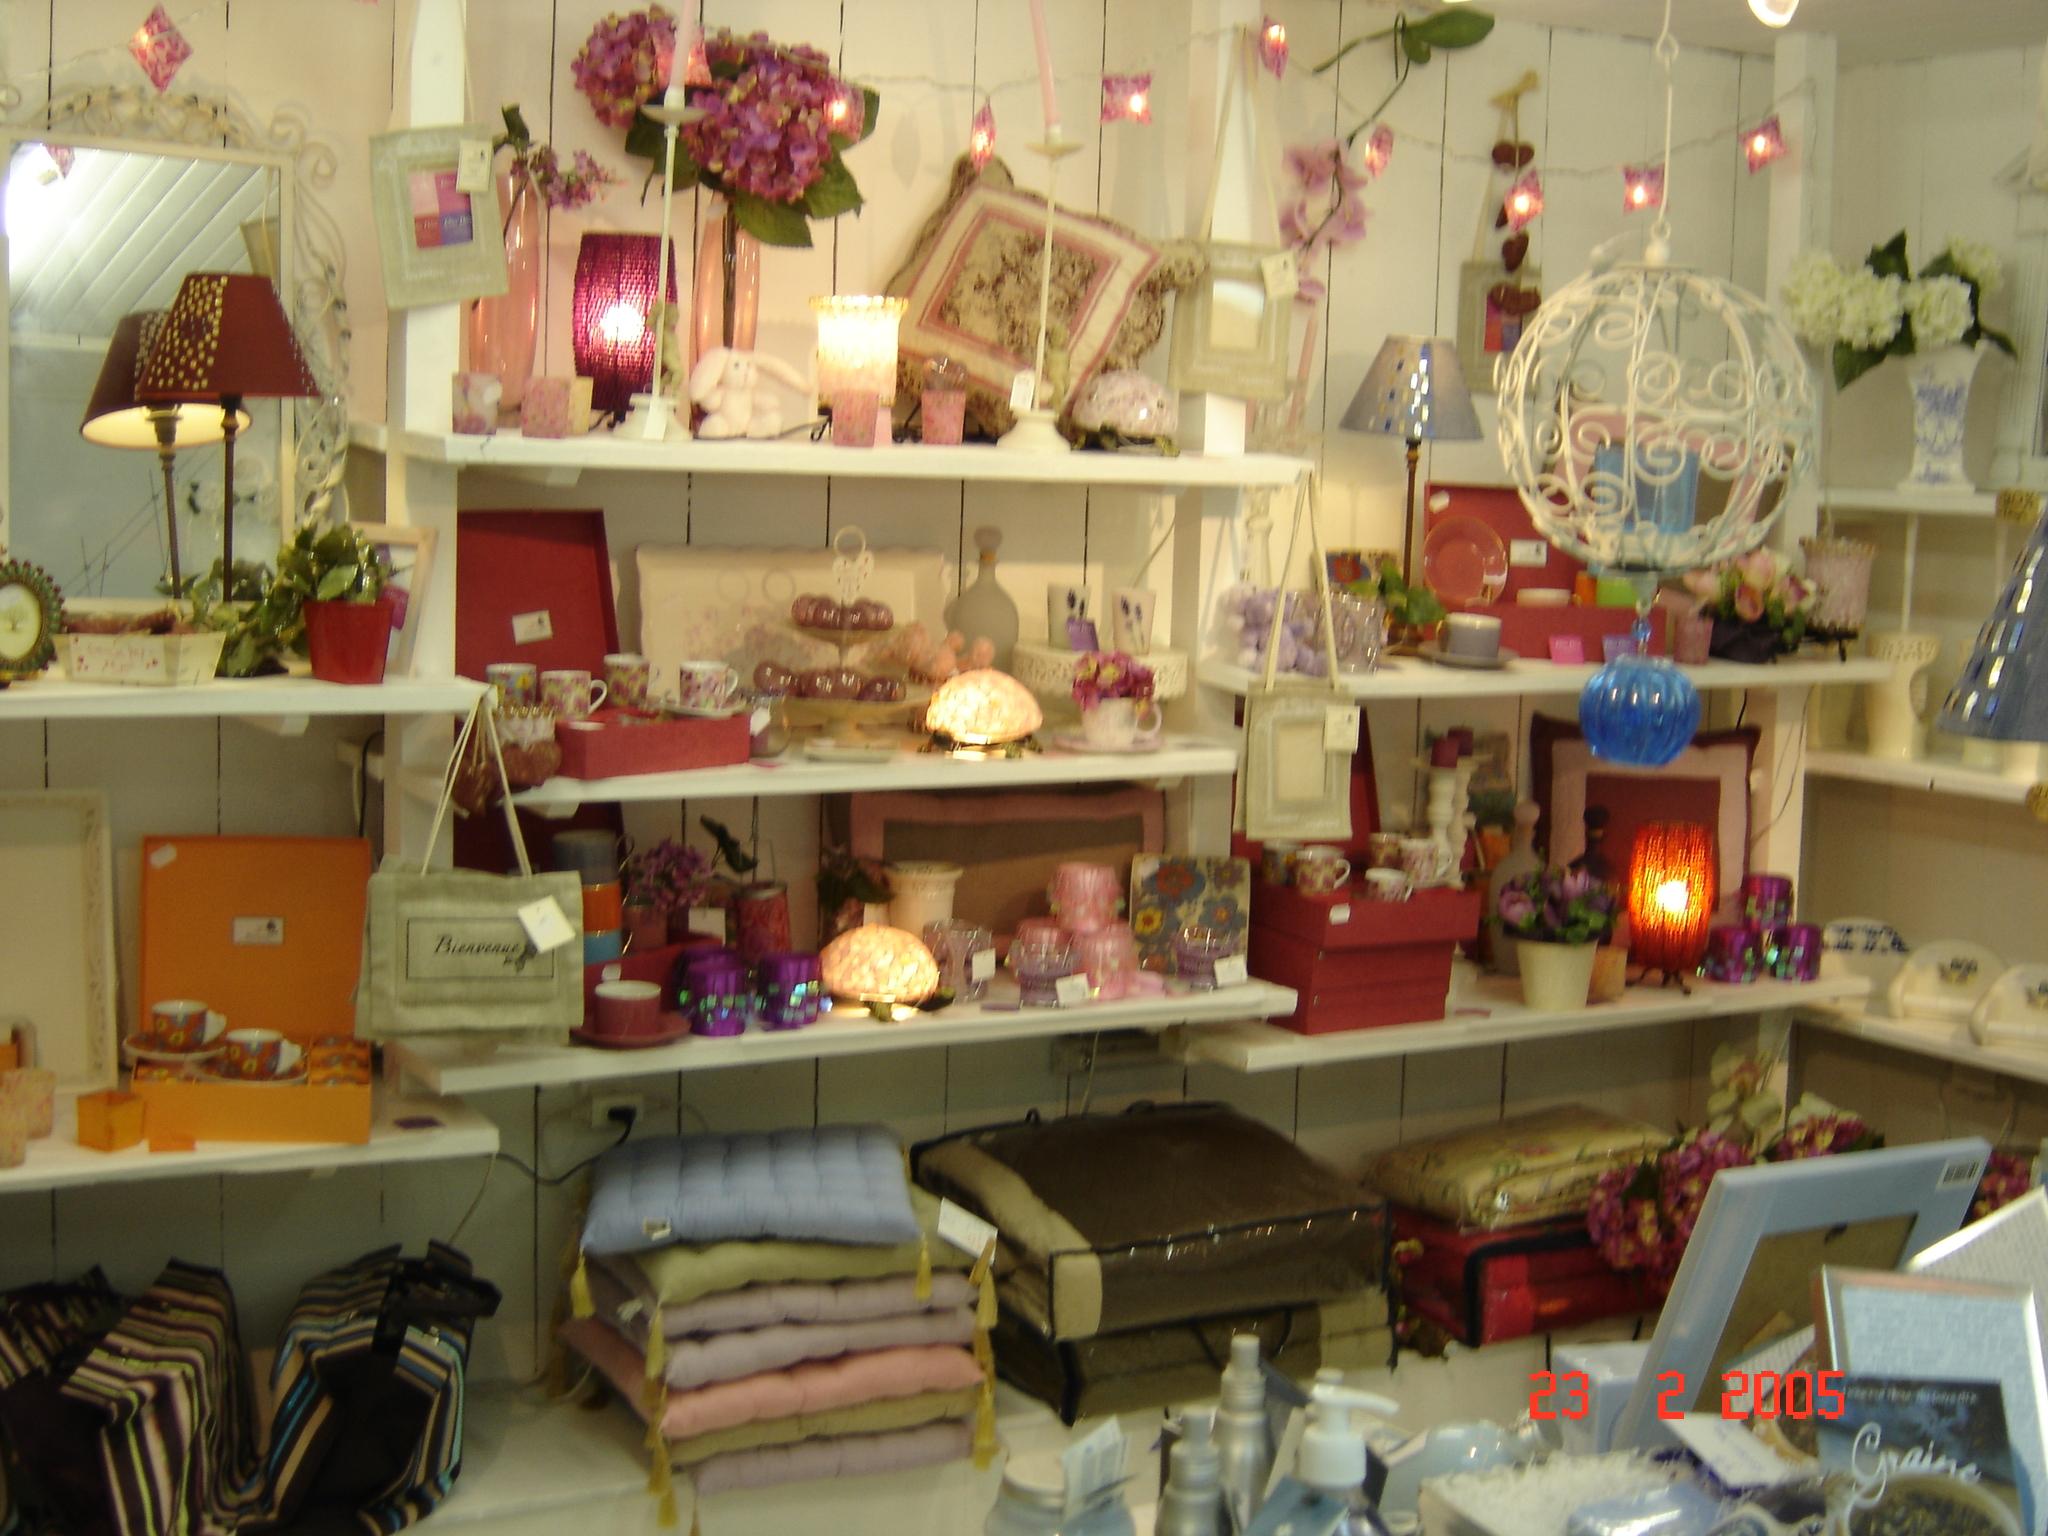 Magasin Des Idees Deco magasin deco valence décorer blog fr magasin decoration